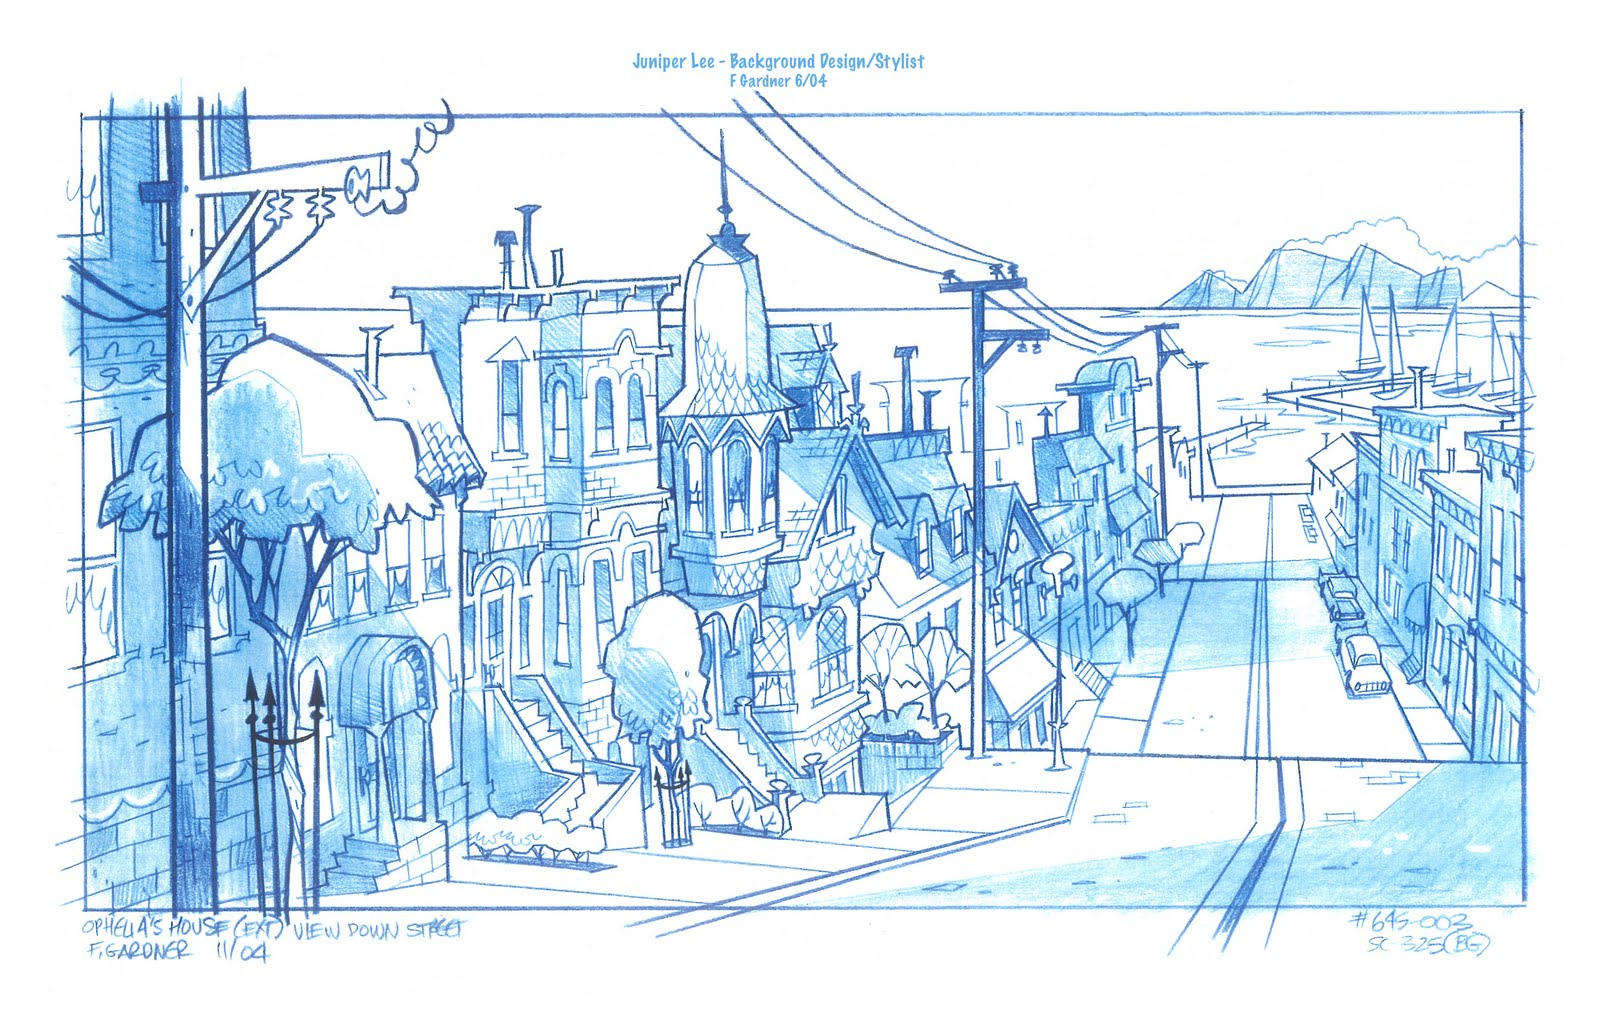 Cartoon Concept Design Juniper Lee Background Design By